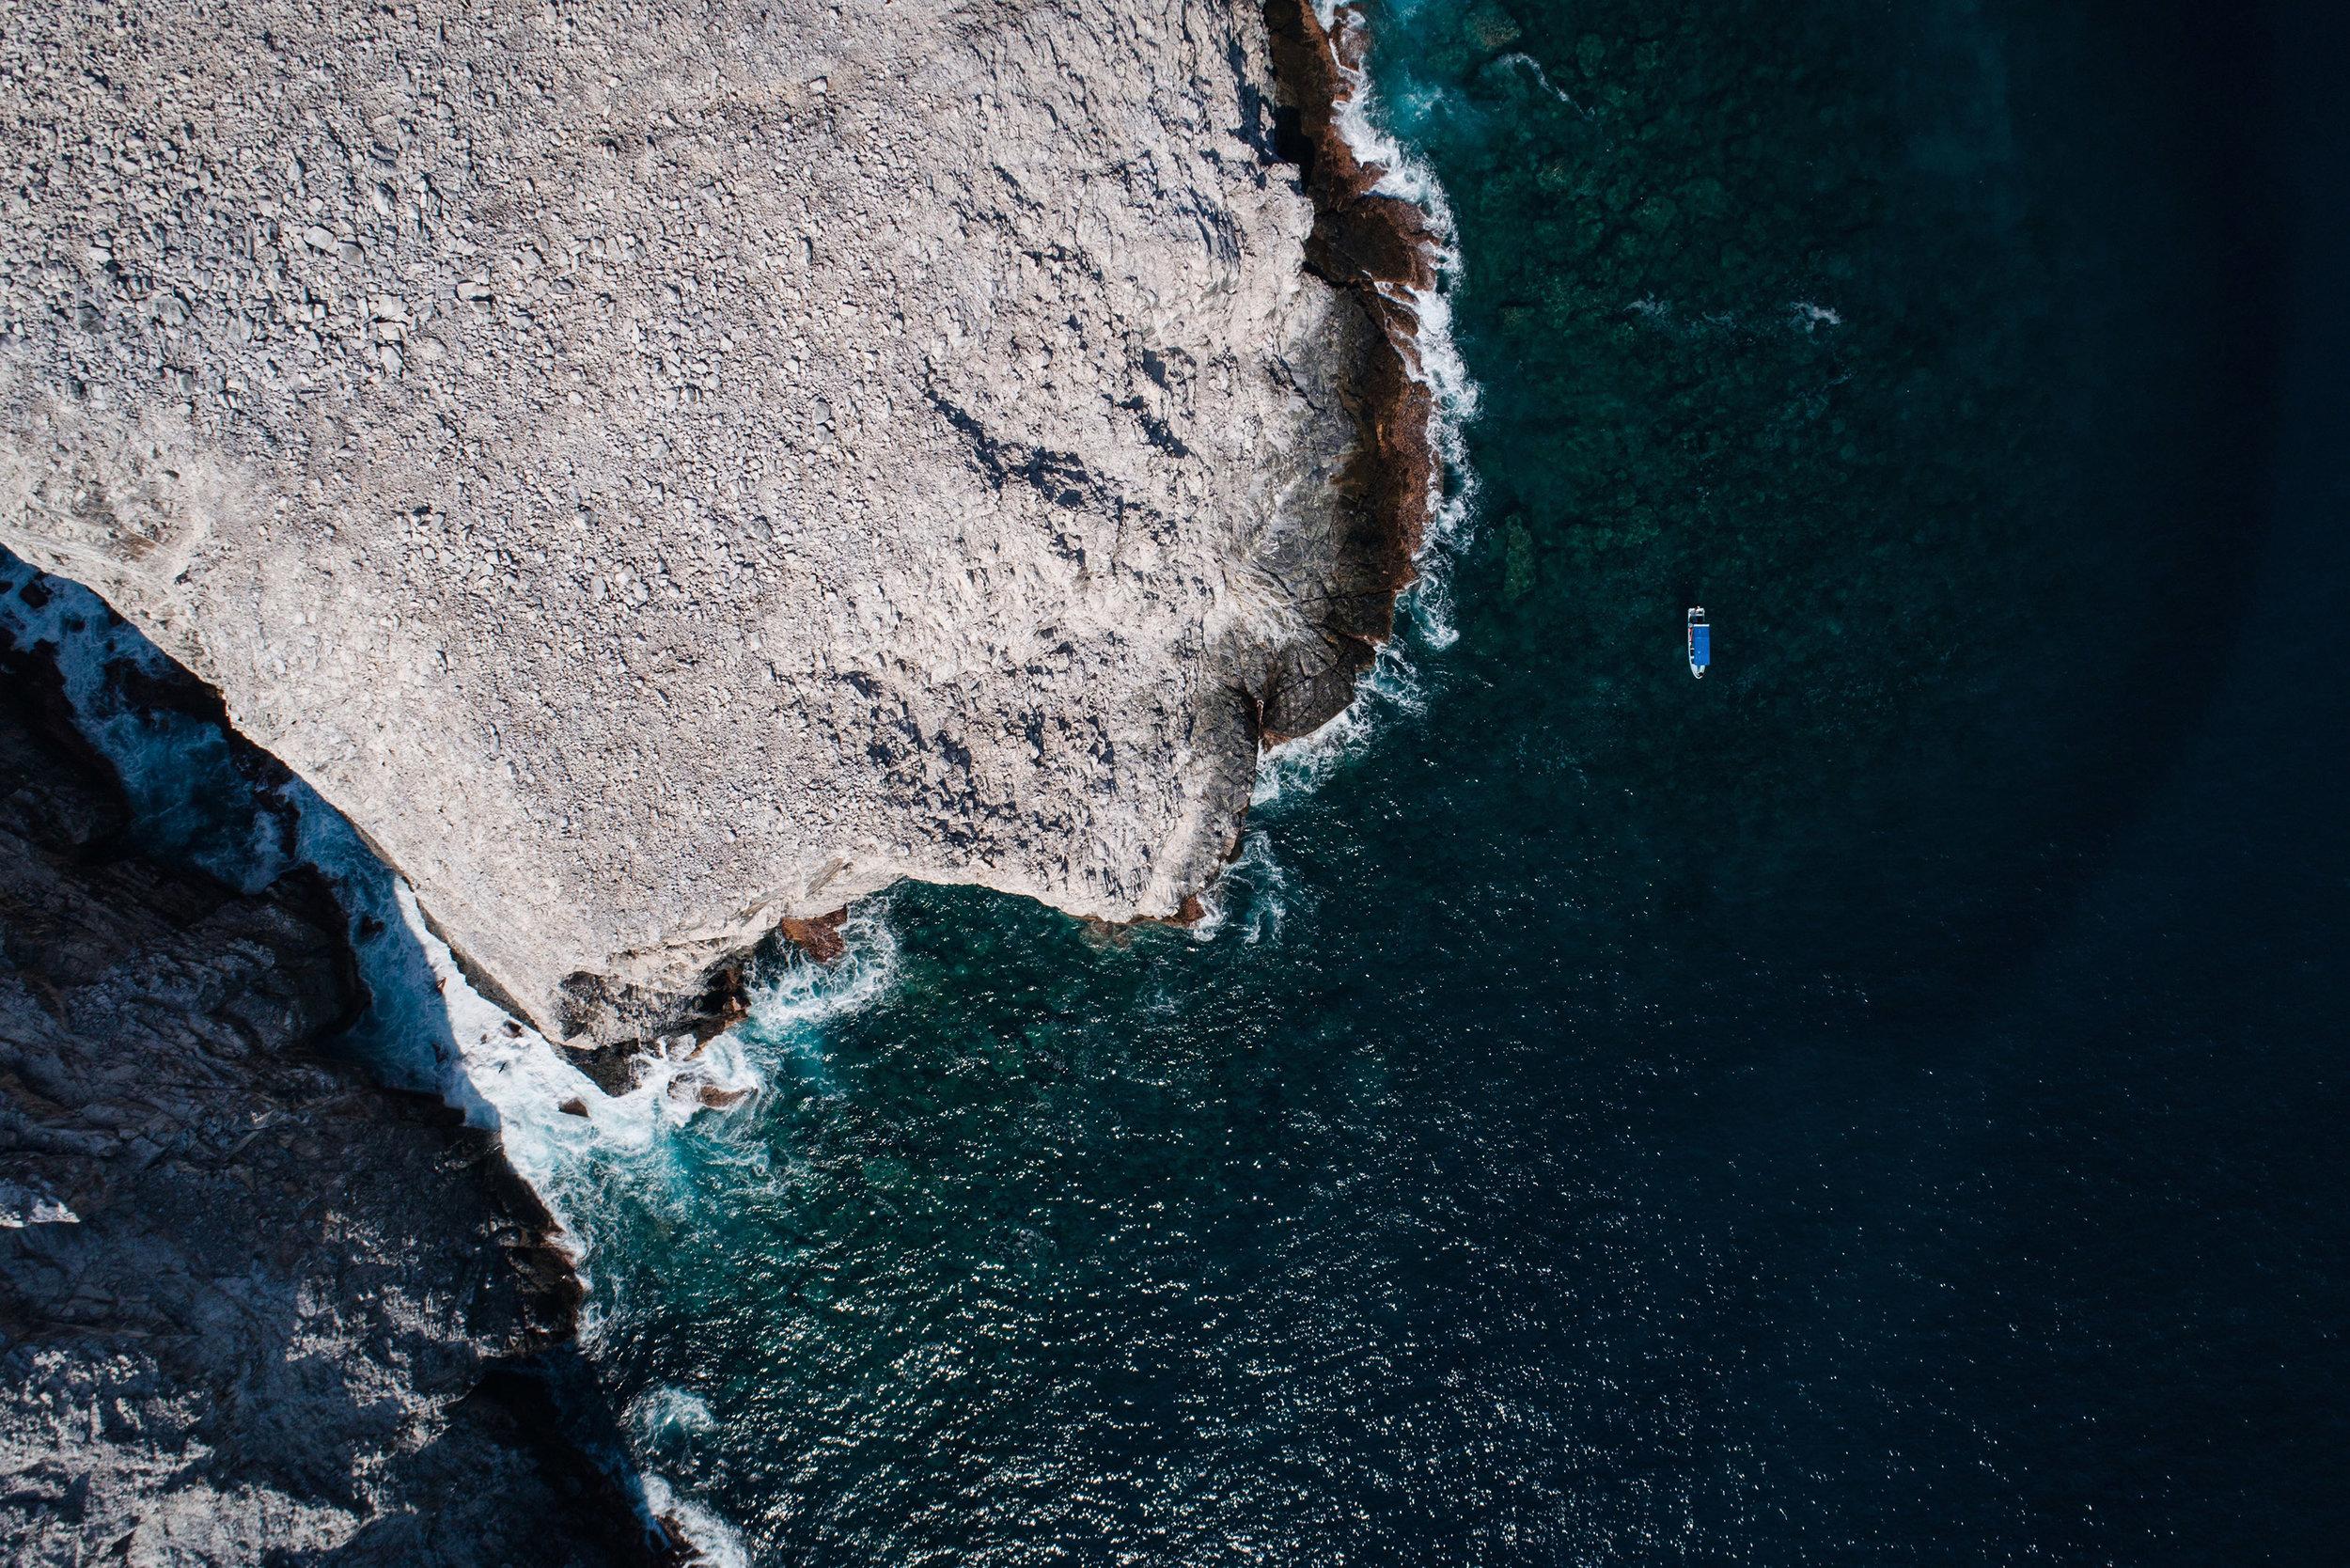 Ballenas-Ixtapa-Zihuatanejo-Fotografia-Heiko-Bothe-11.JPG